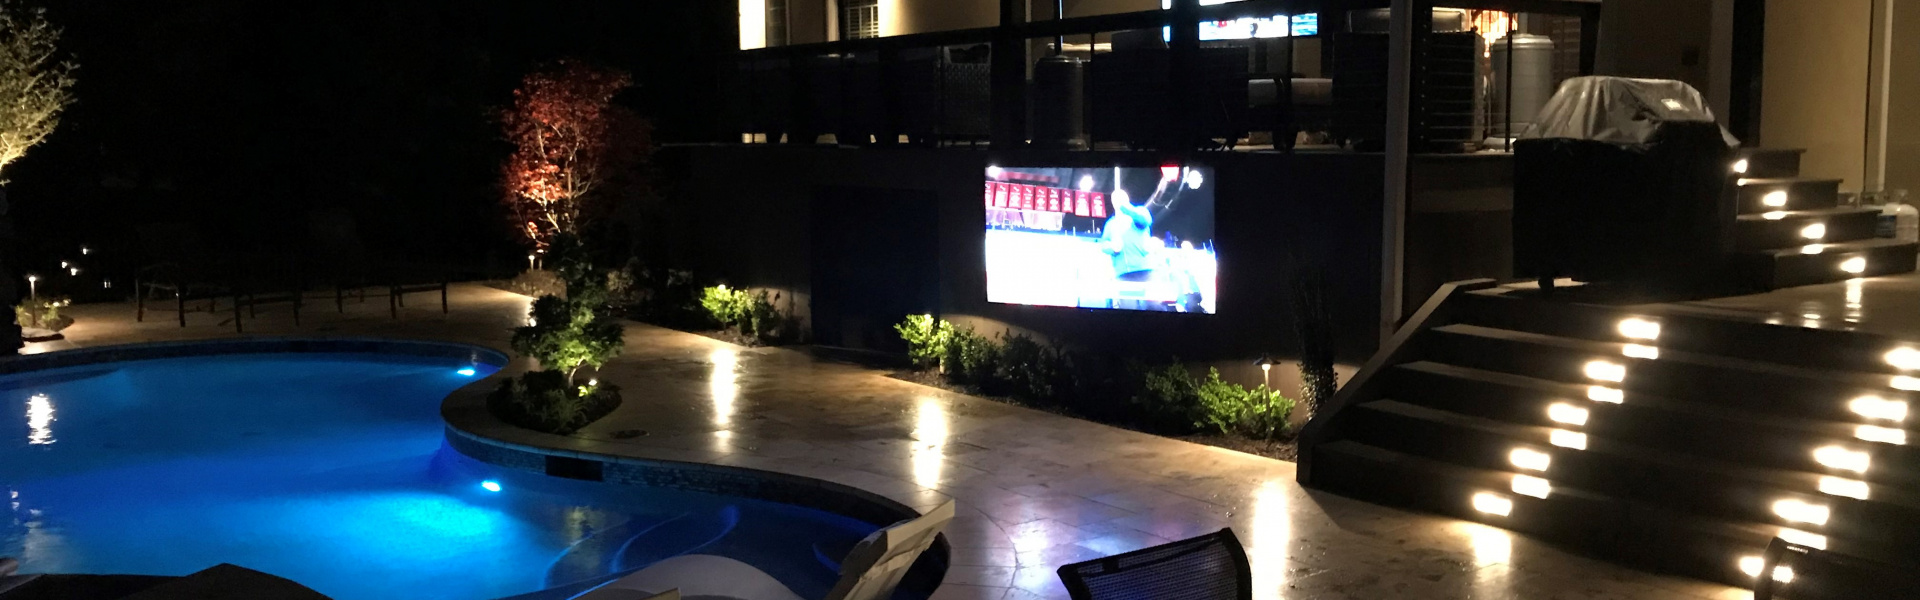 Smart home installation by Atlanta Audio & Automation for Alpharetta